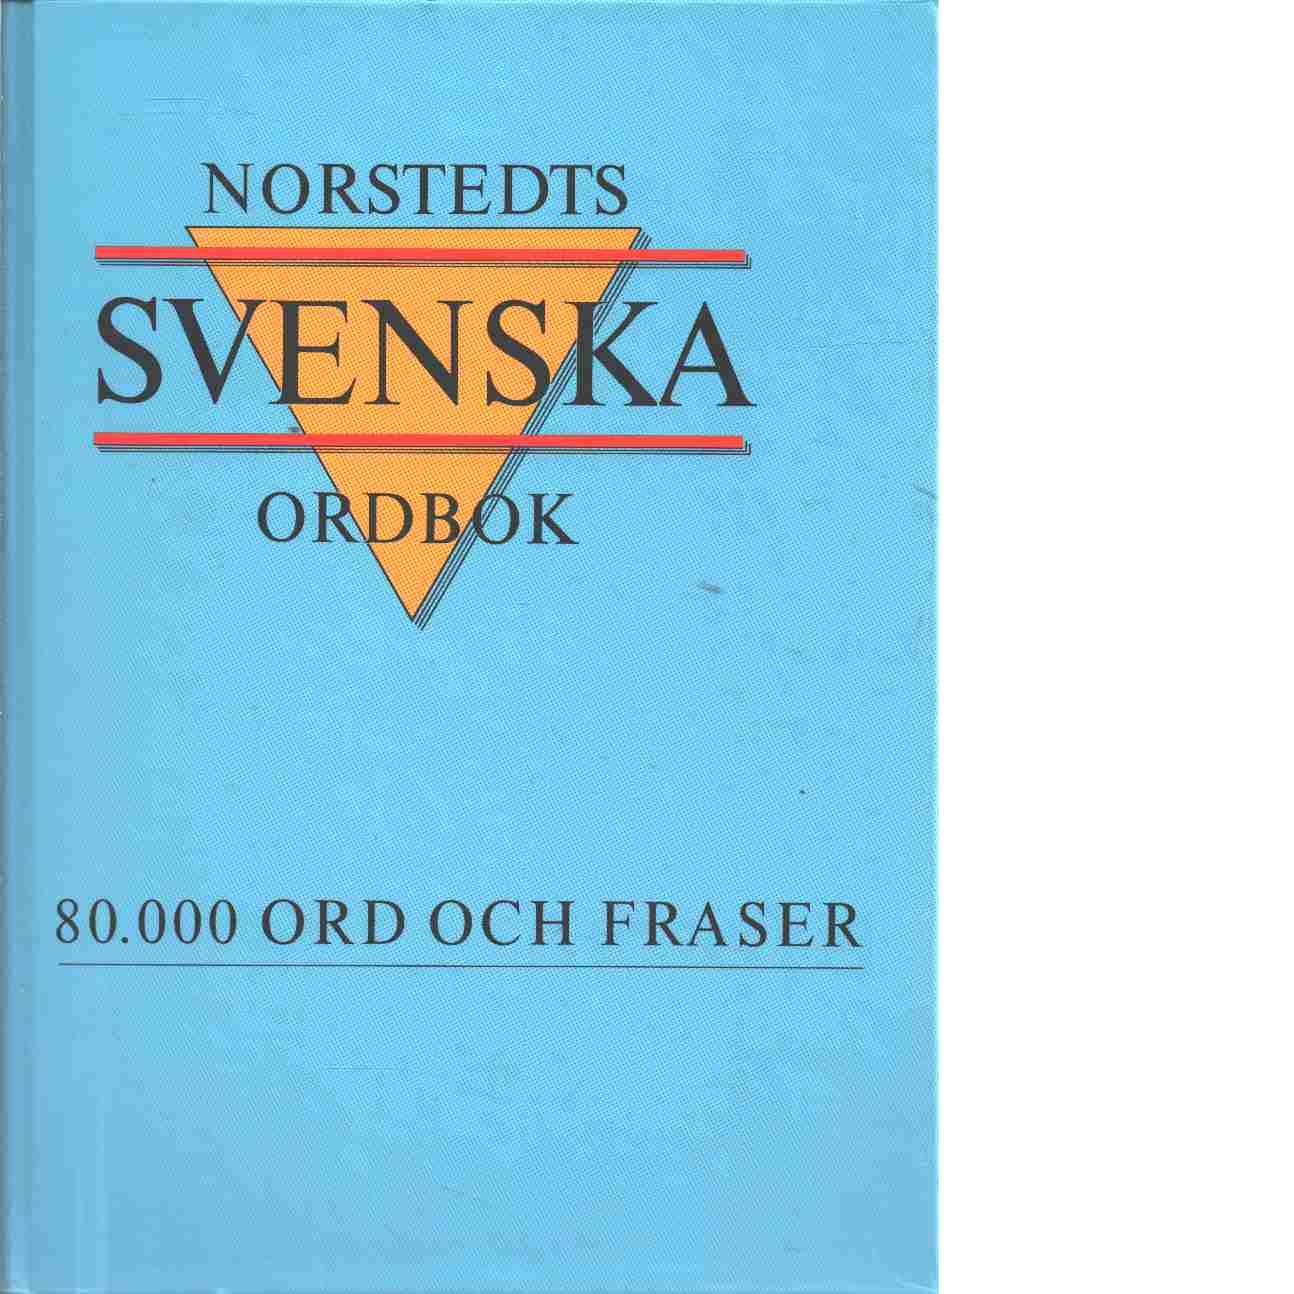 Norstedts svenska ordbok - Red. Allén, Sture